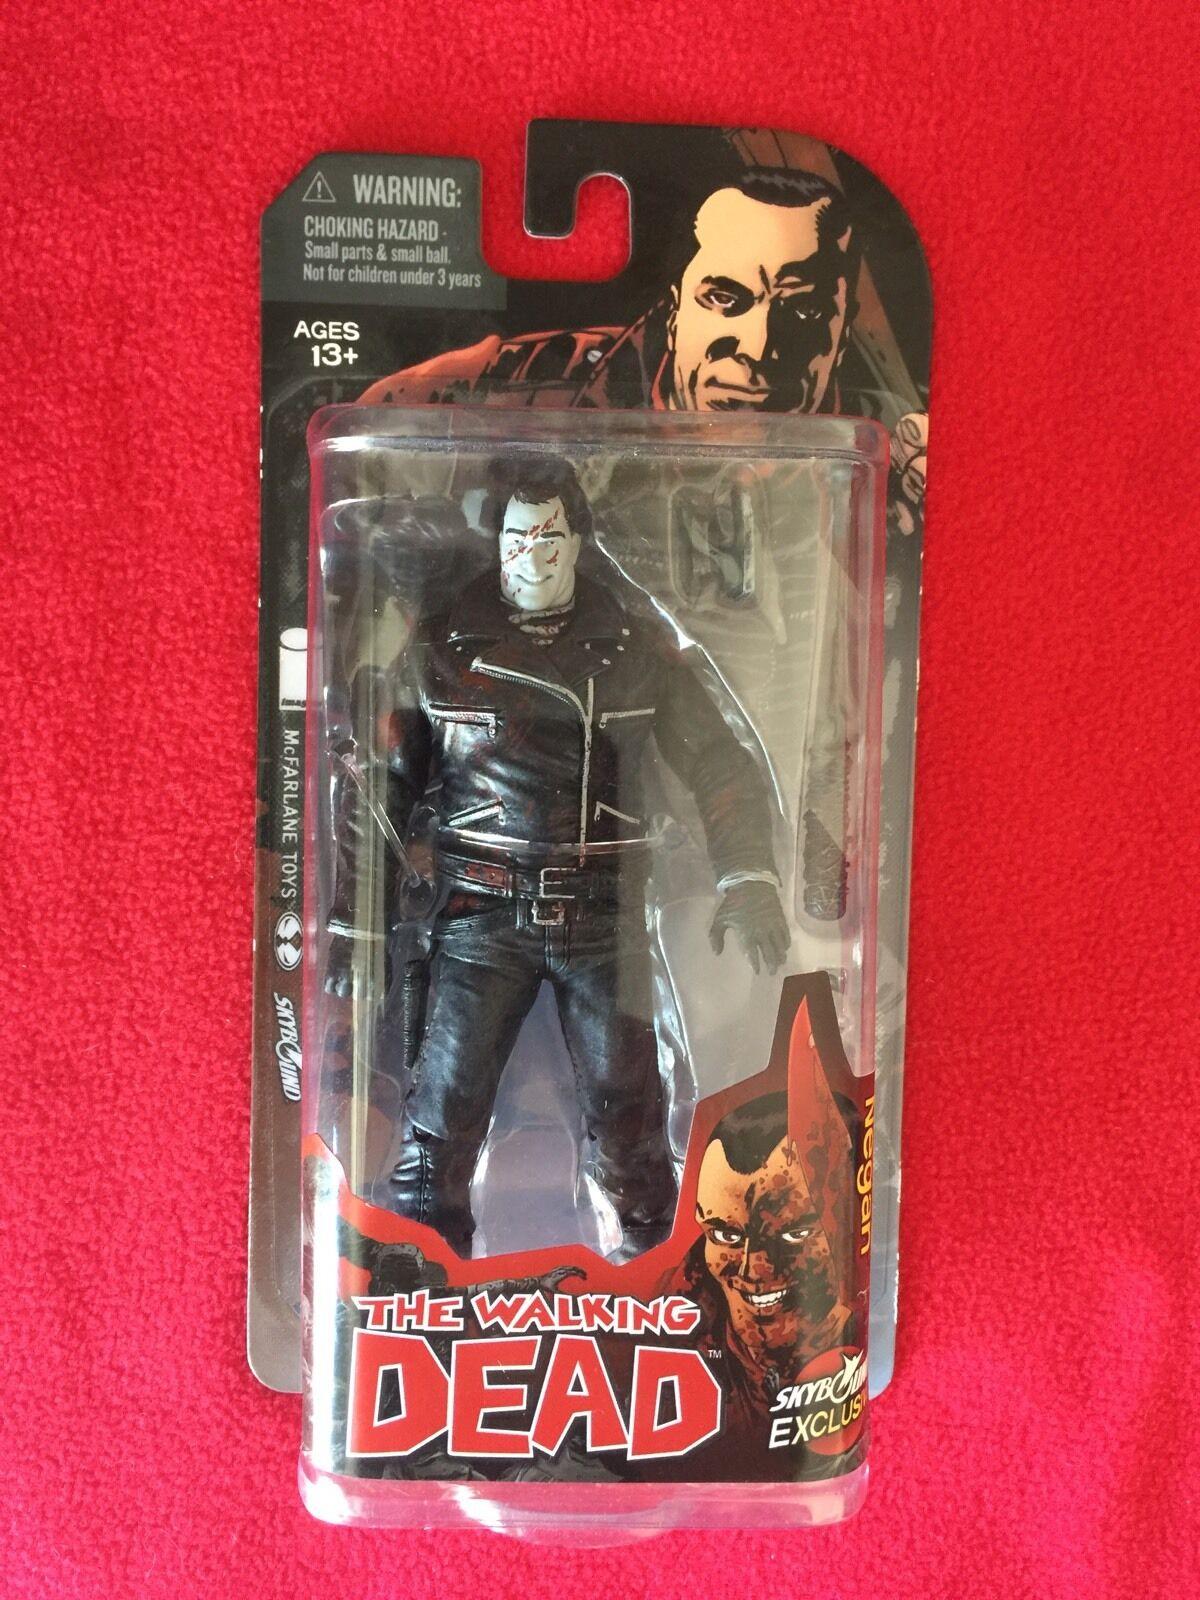 The Walking Dead NEGAN Skybound figure B&W NEW IN BOX McFarlane Toys Nice